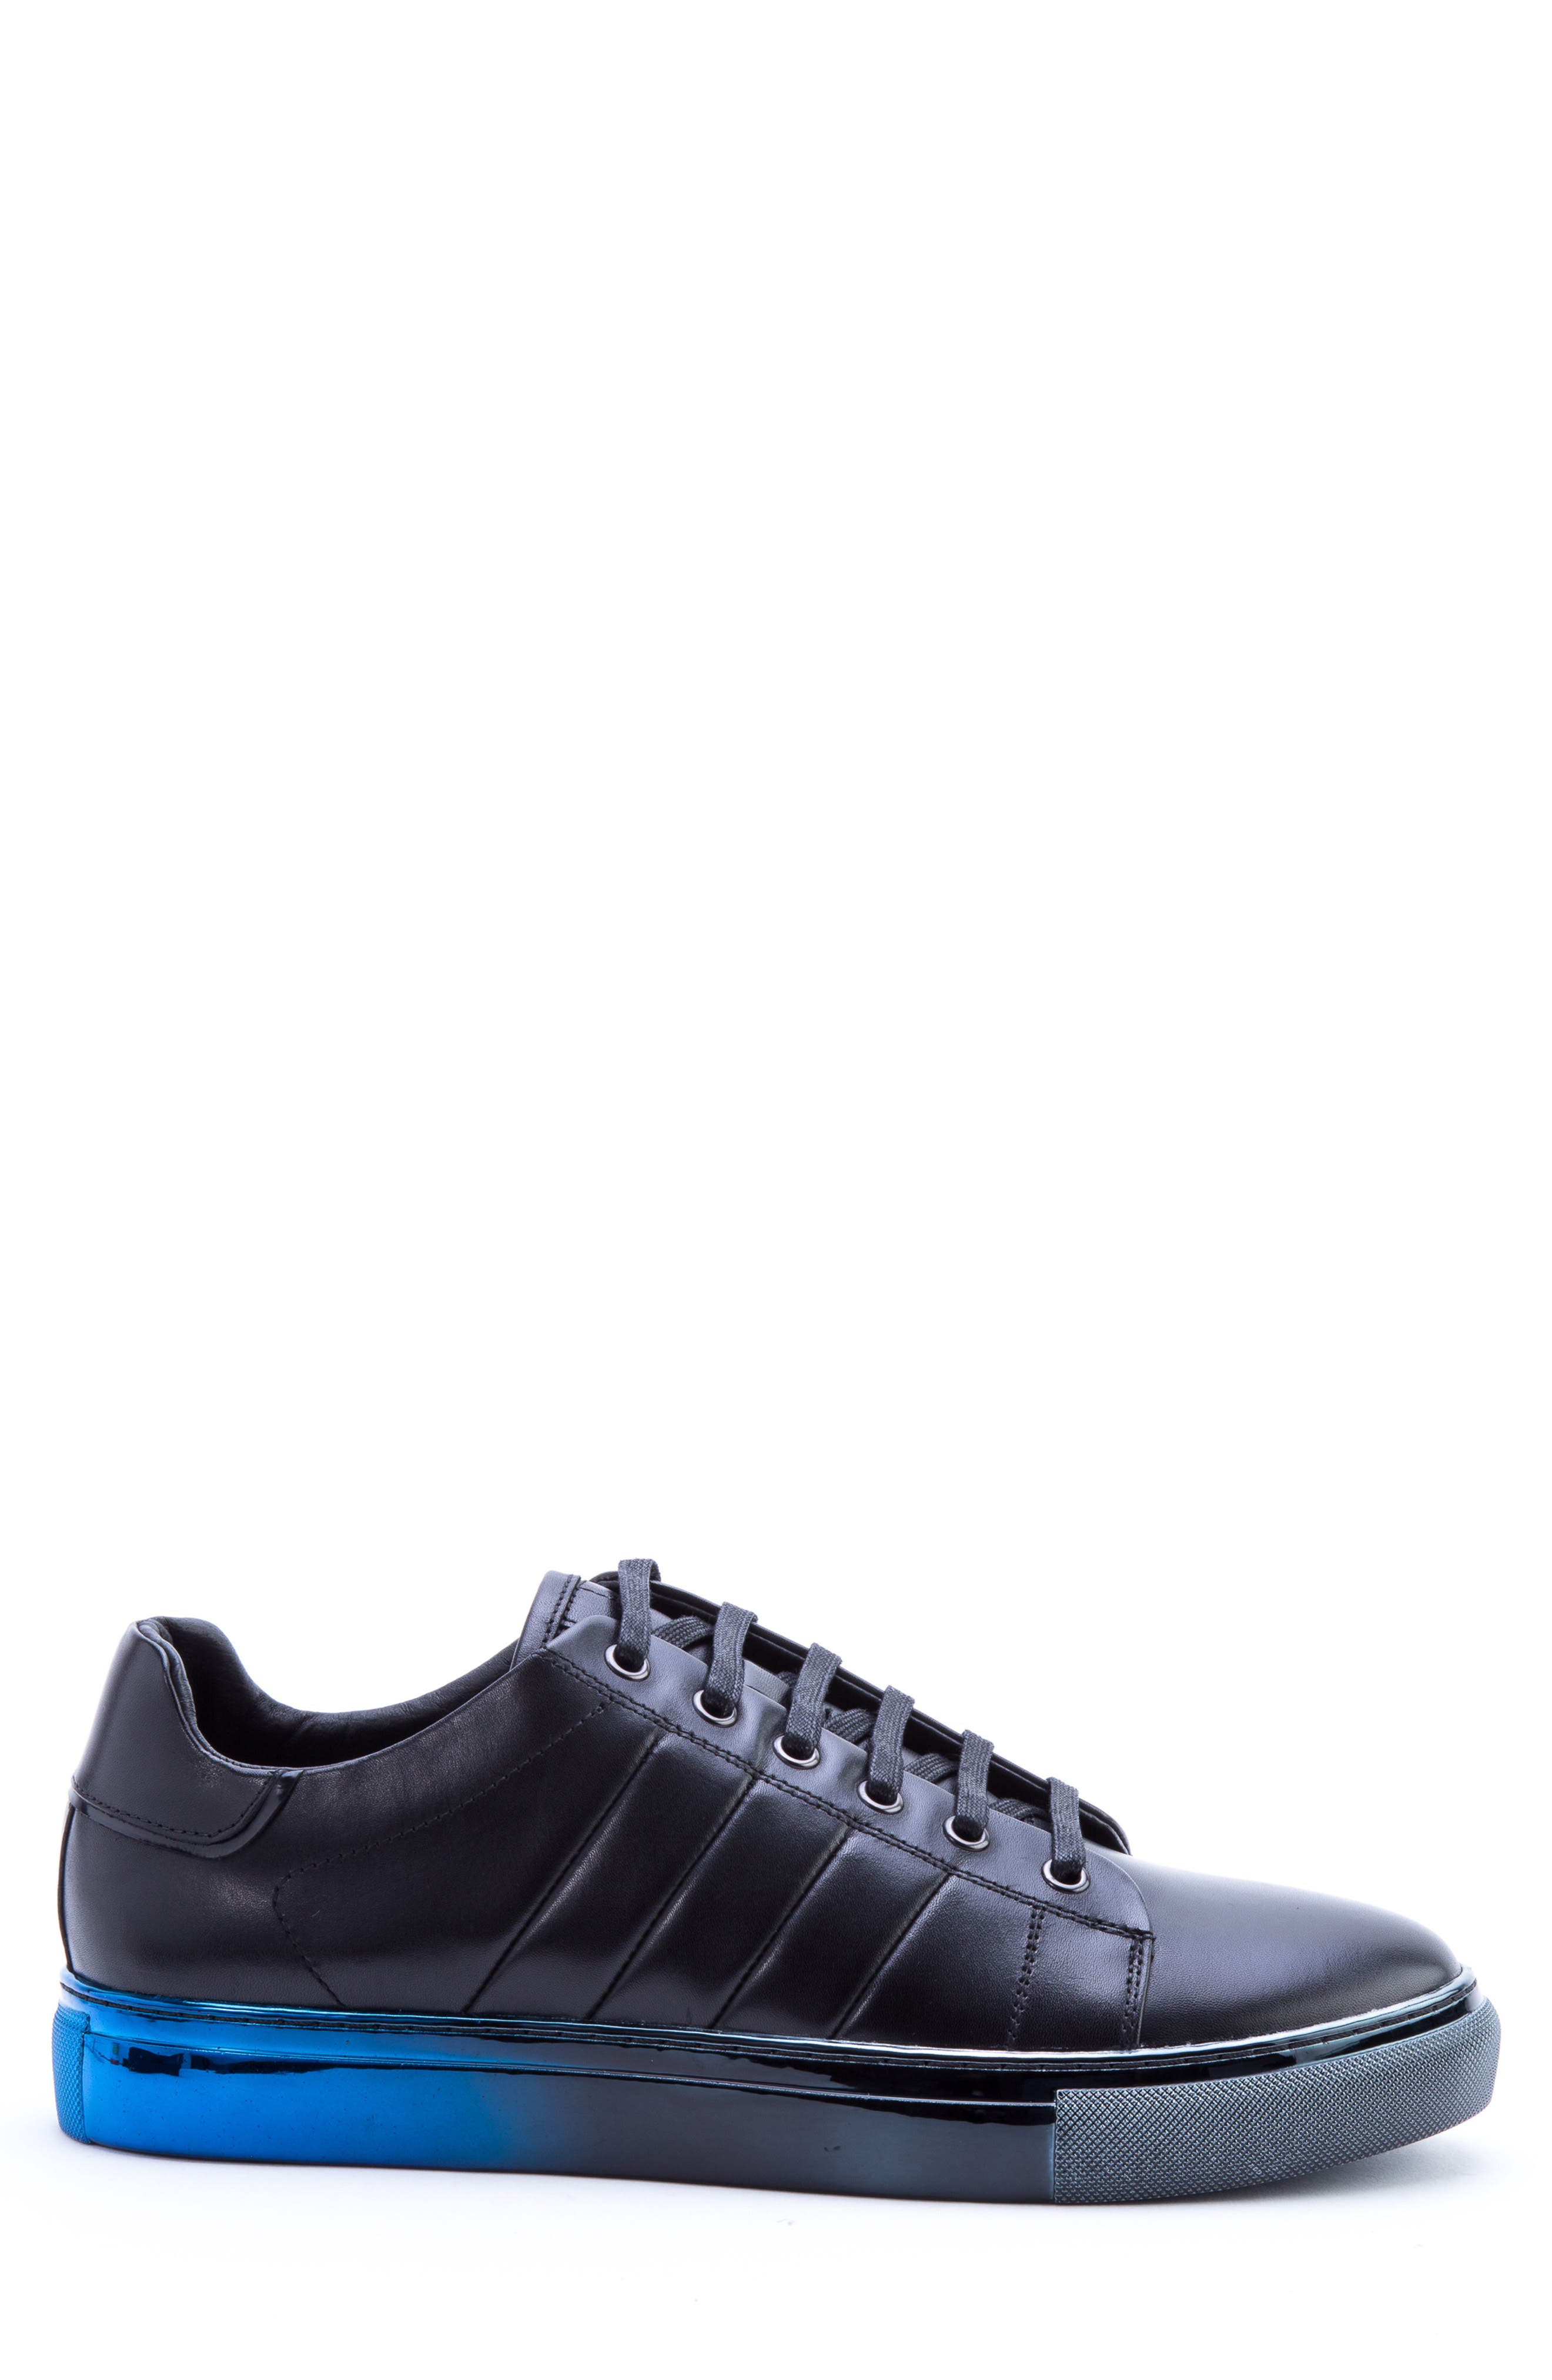 BADGLEY MISCHKA COLLECTION, Badgley Mischka Brando Sneaker, Alternate thumbnail 3, color, BLACK LEATHER